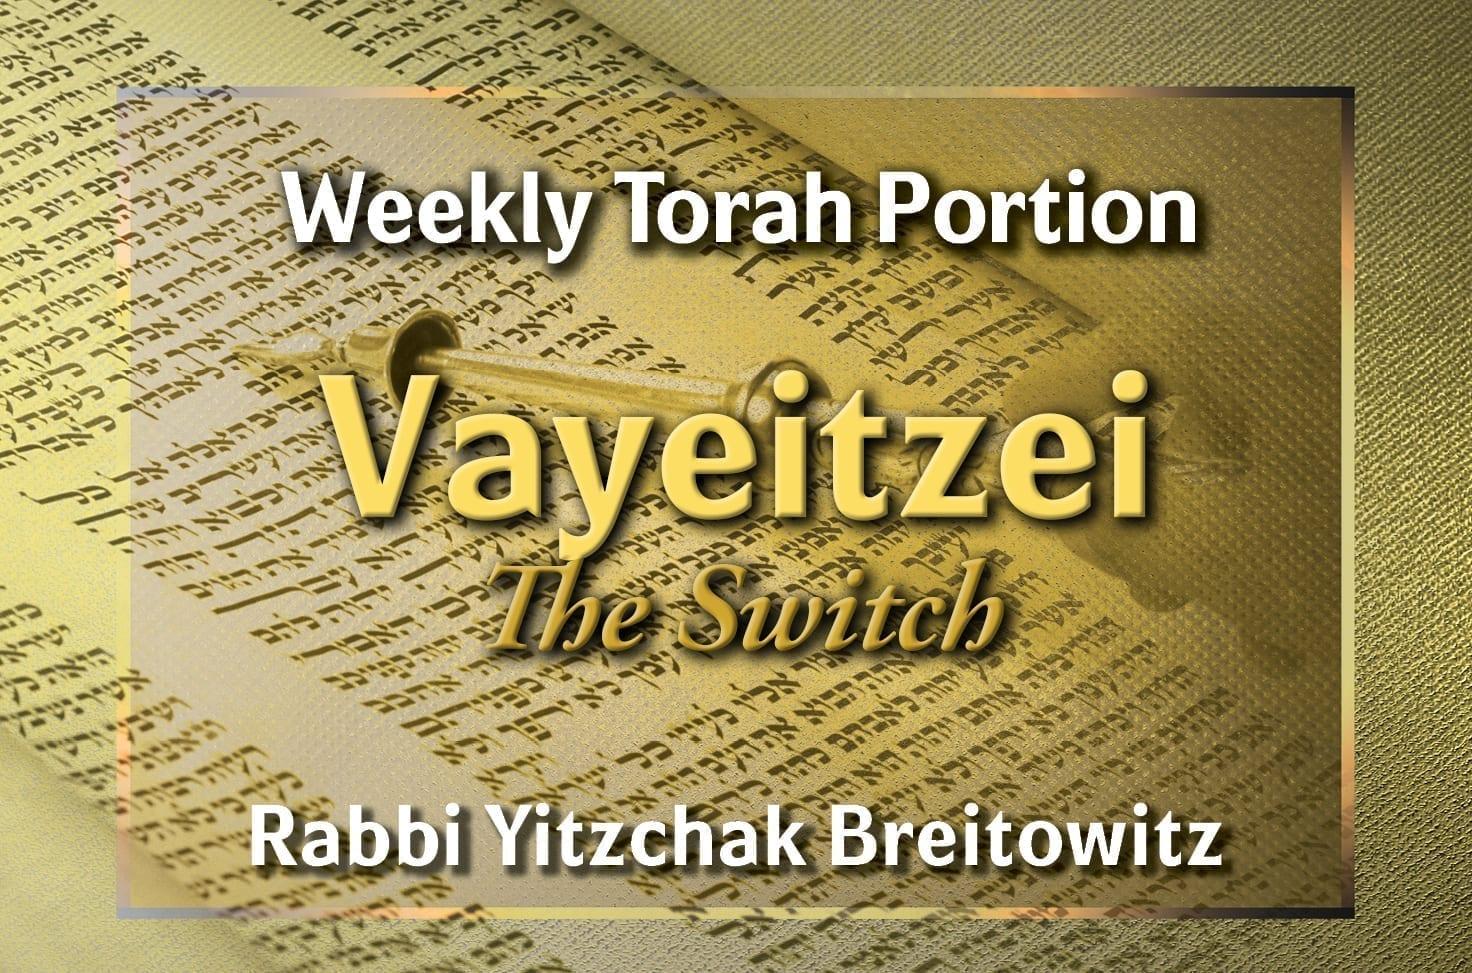 Photo of Parshat Vayeitzei – The Switch